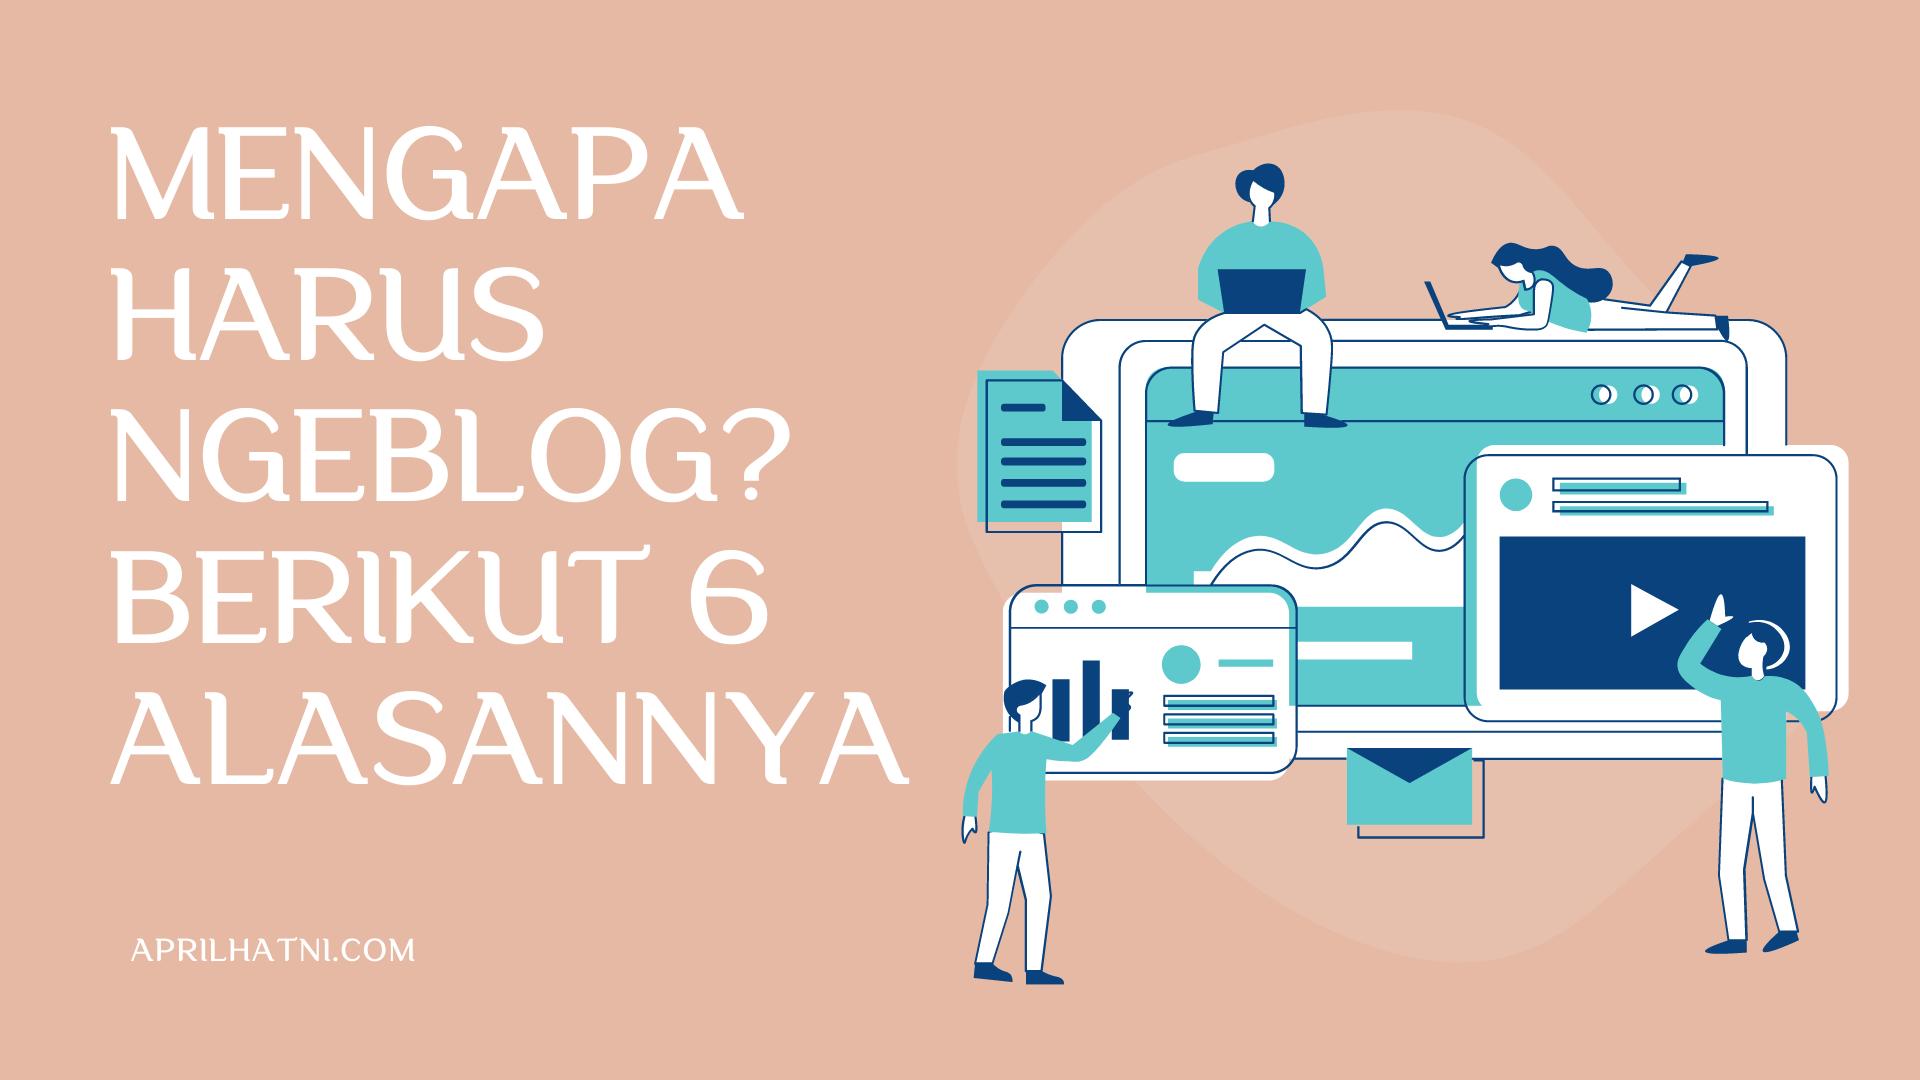 mengapa harus ngeblog